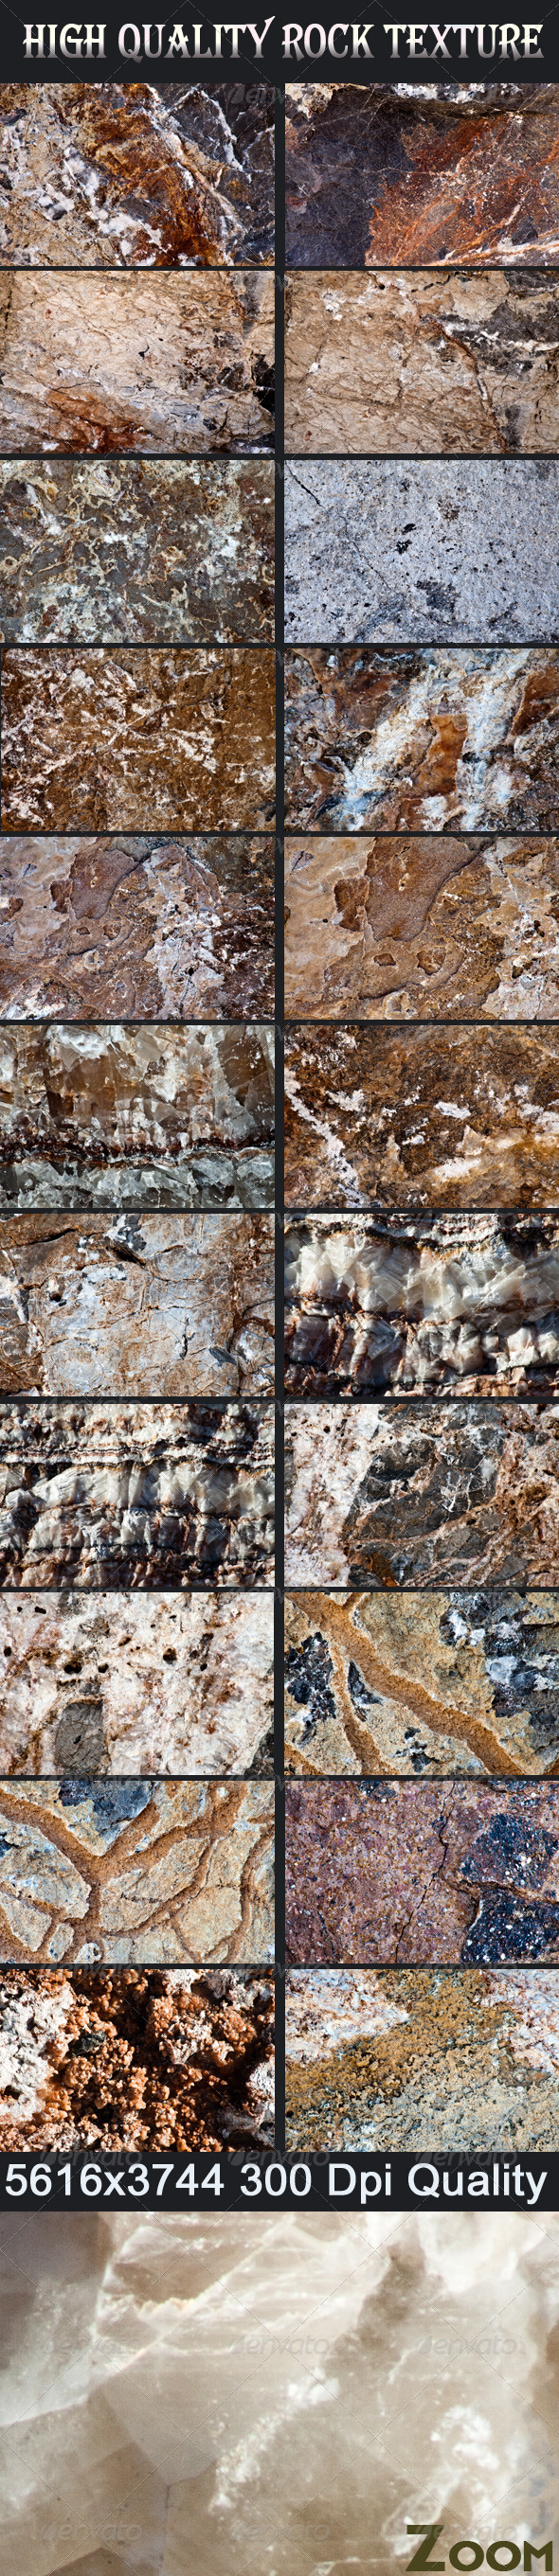 22 Rock Texture - Stone Textures